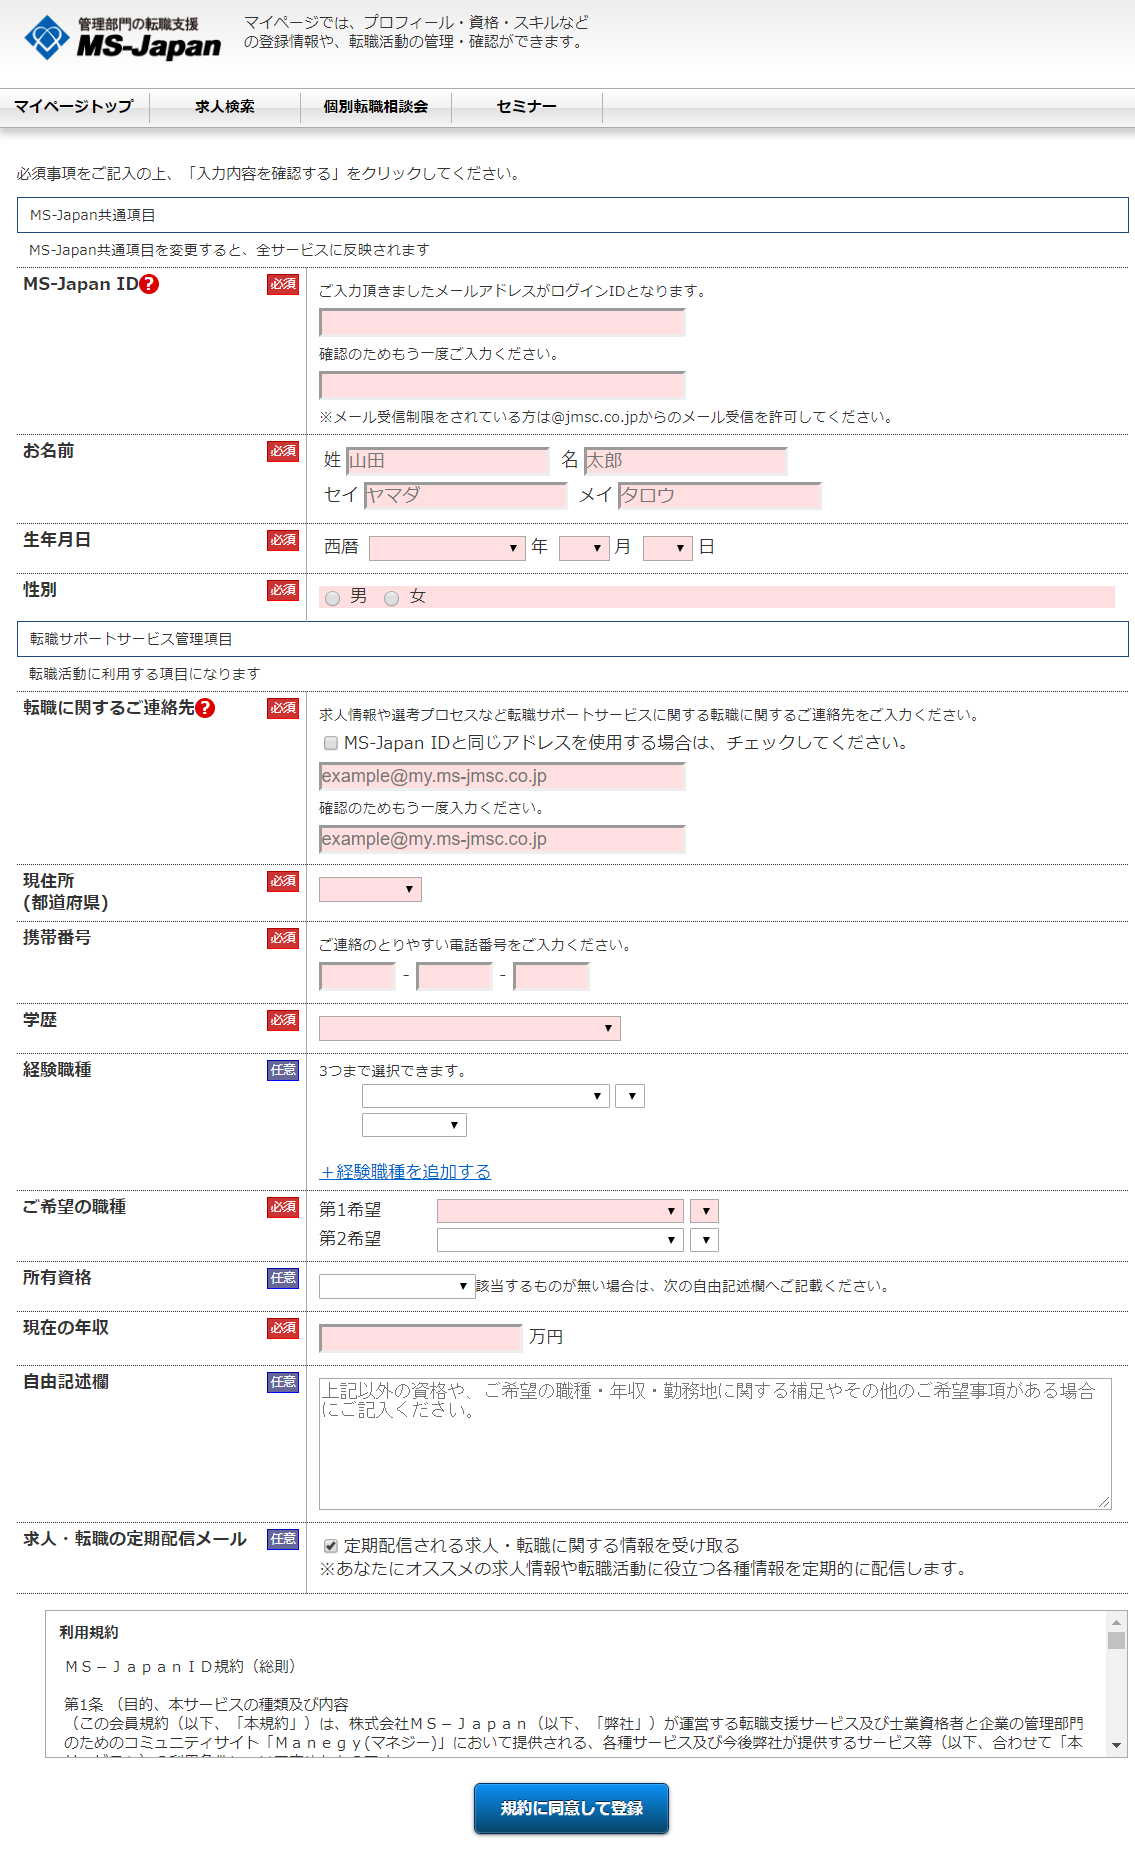 【MS-Japan】登録画面